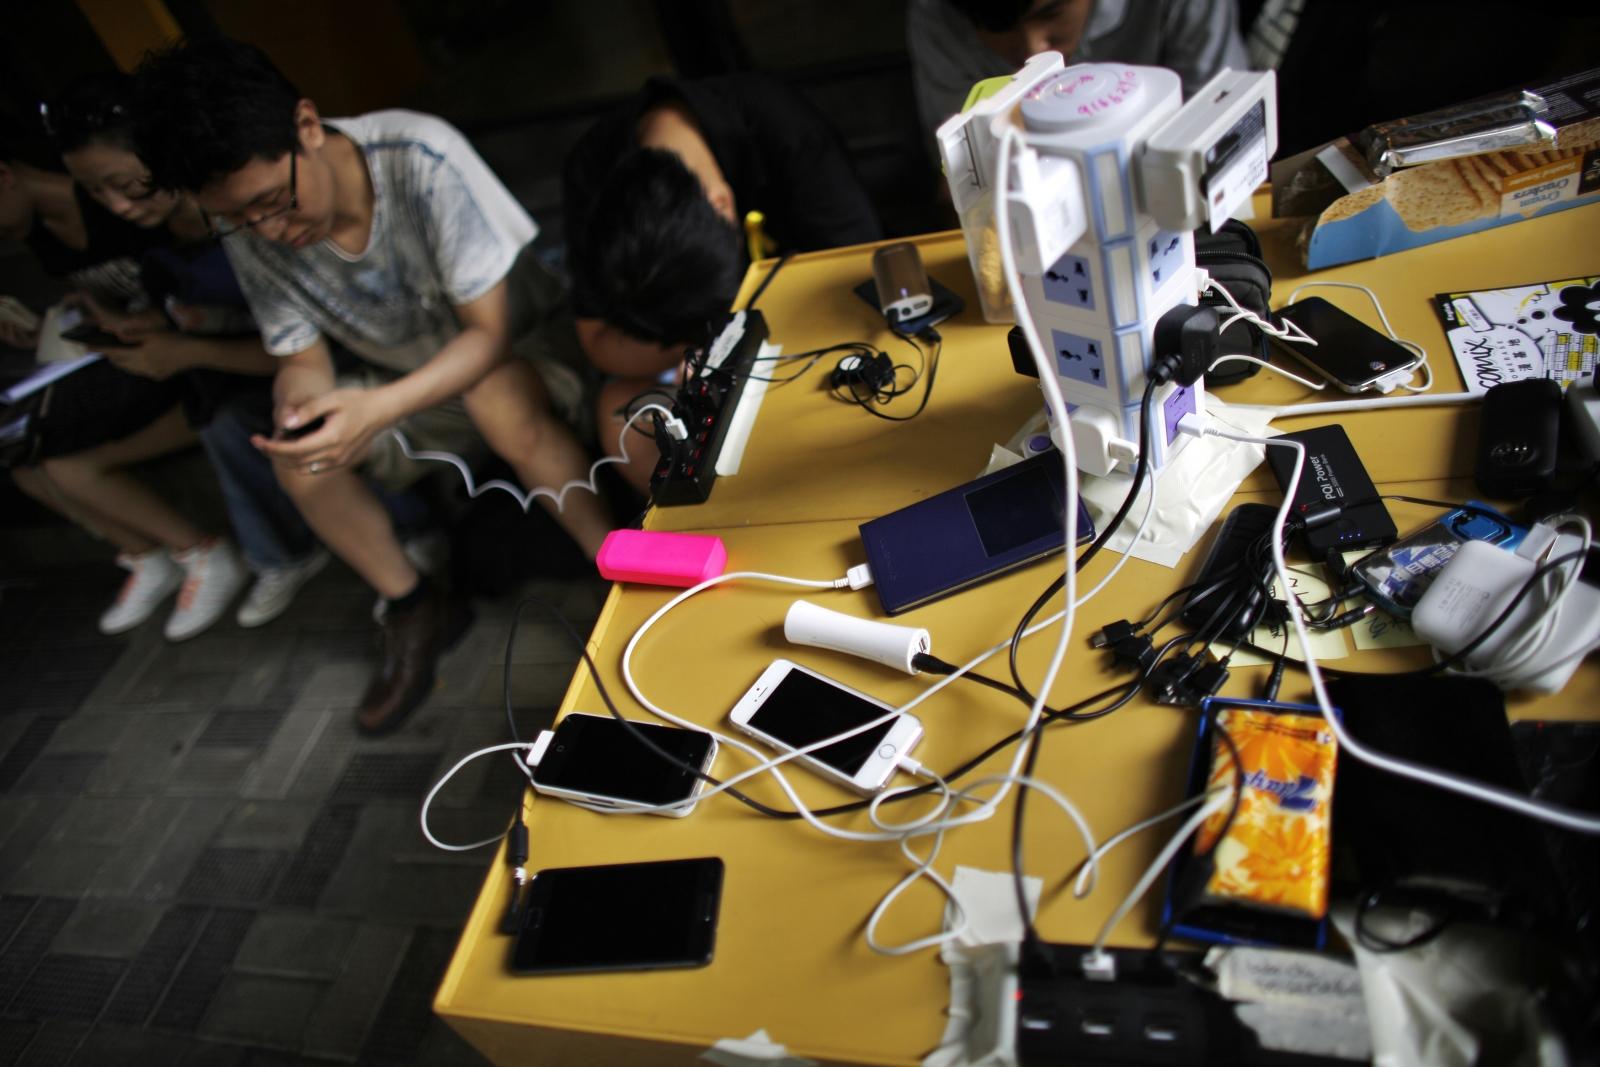 Sophisticated iOS Malware Targets Hong Kong Protesters